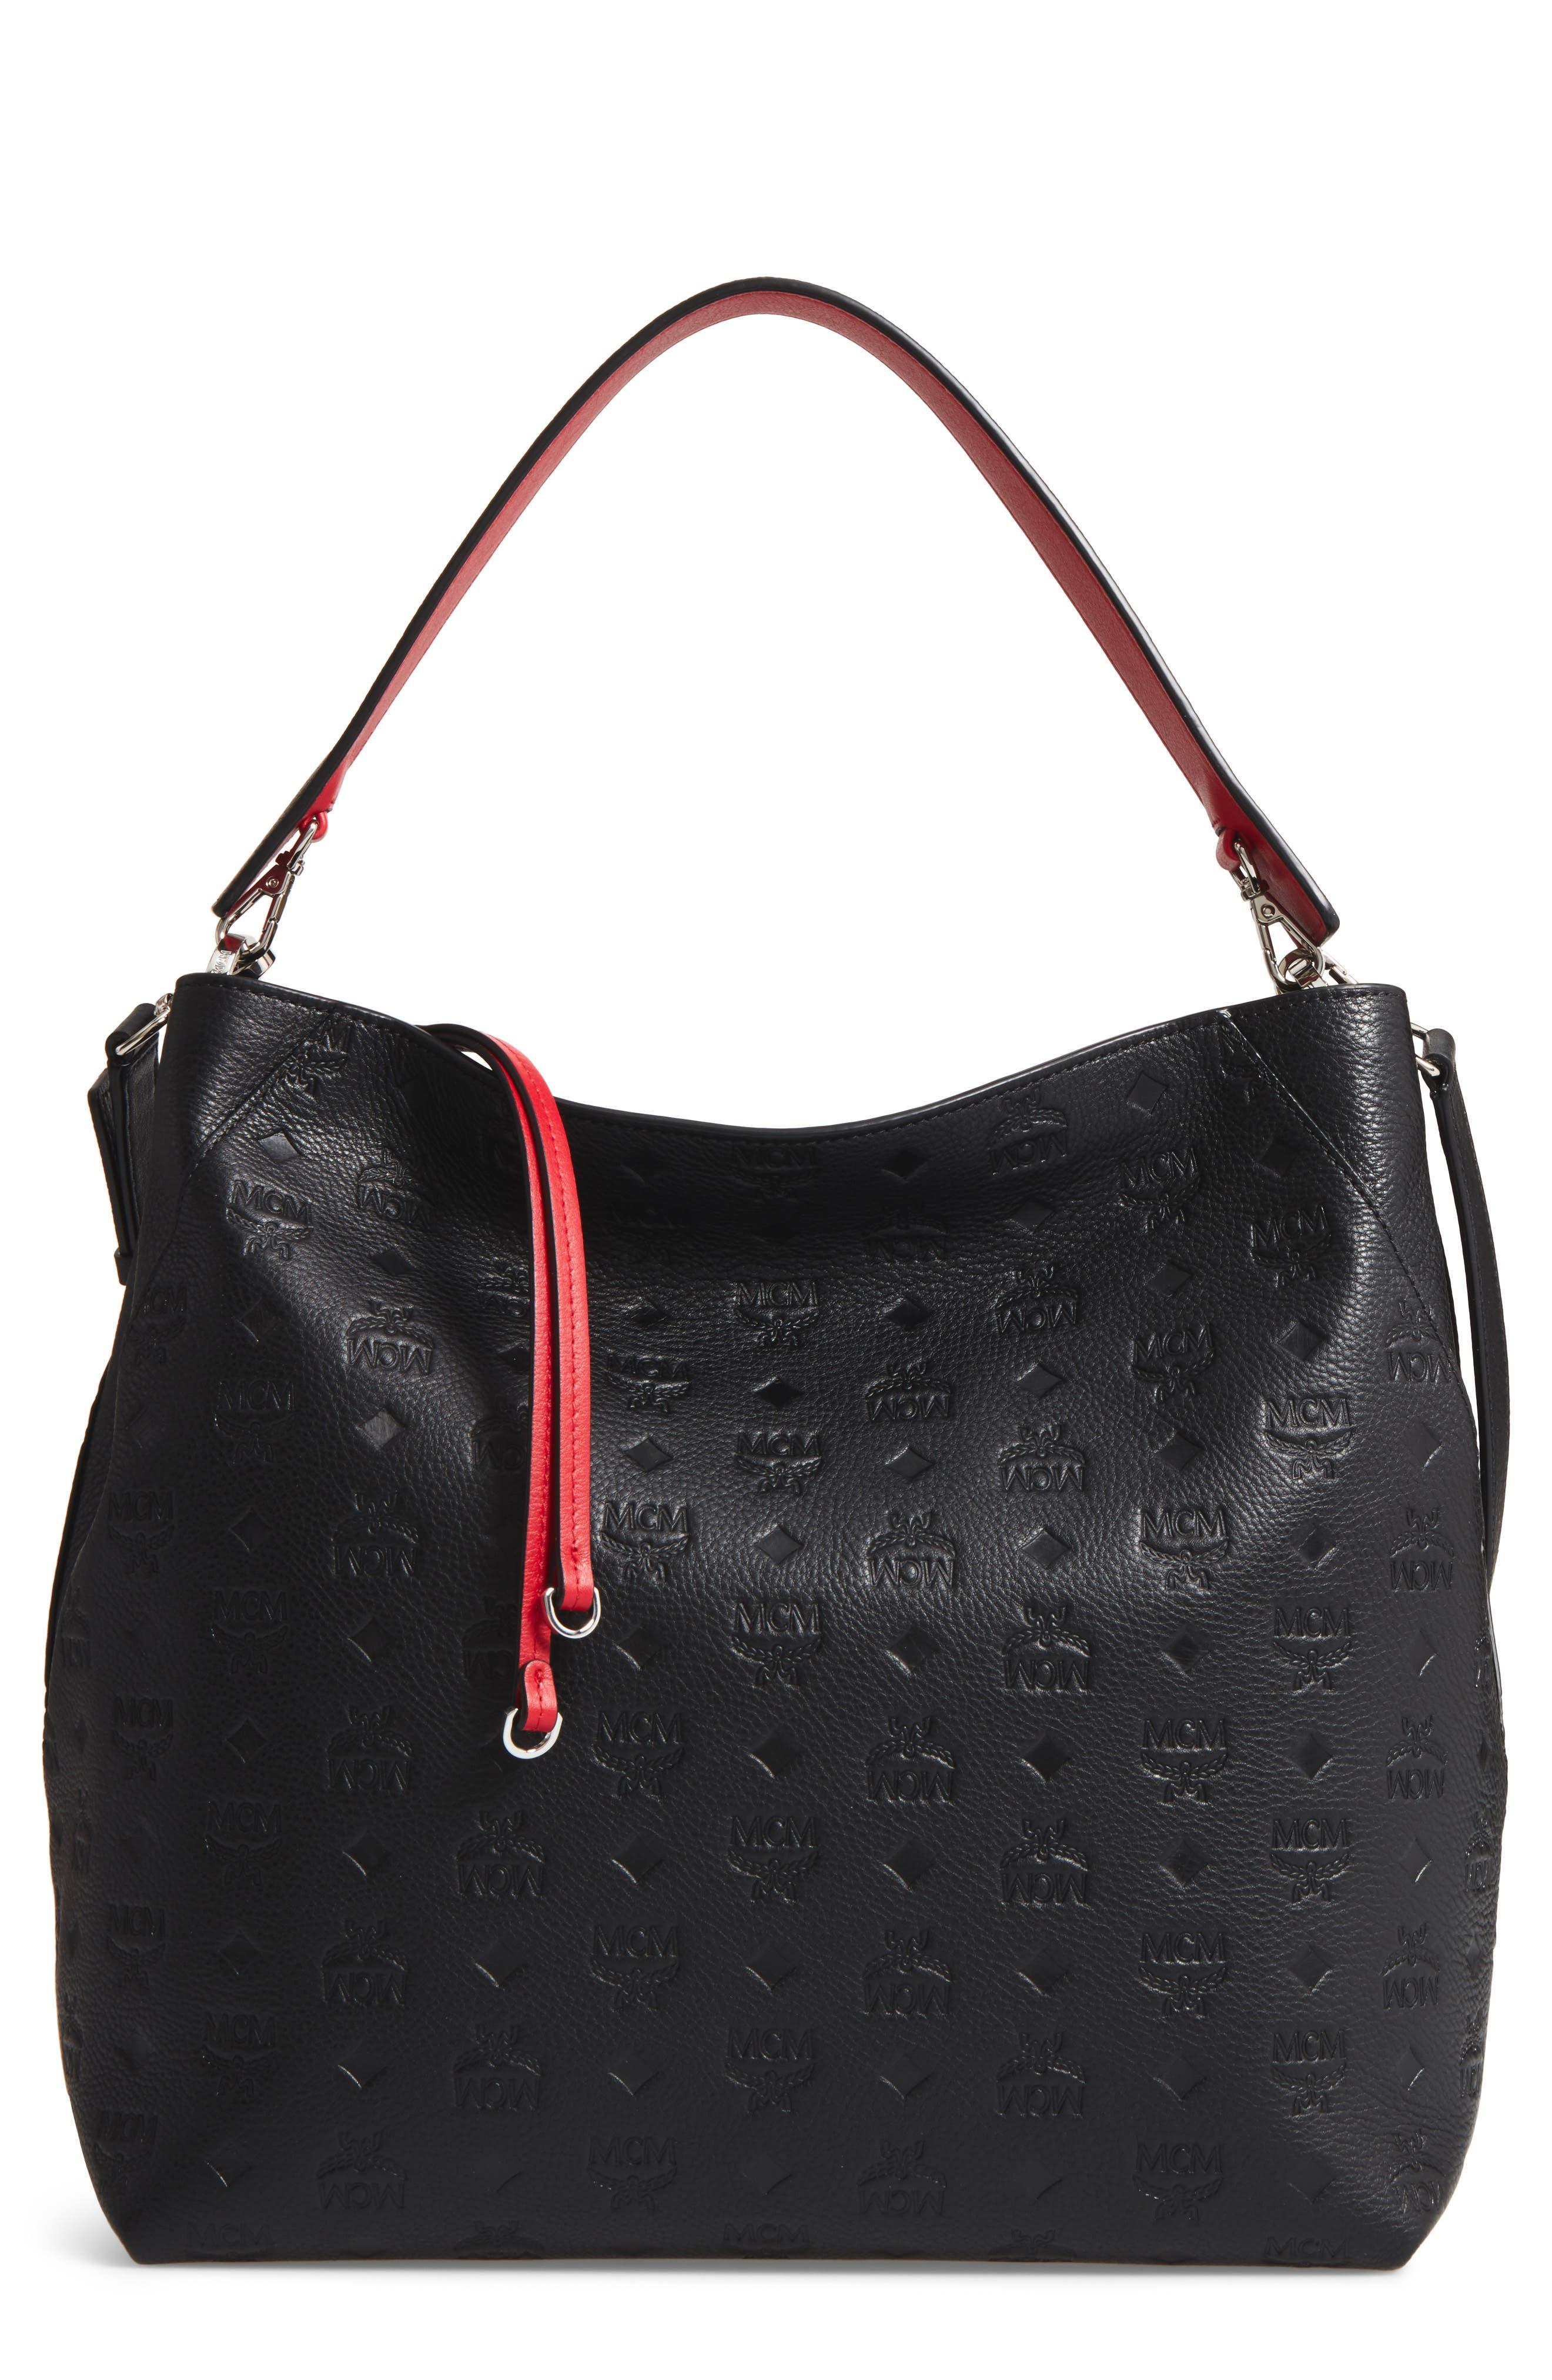 Klara Monogrammed Leather Hobo Bag,                             Main thumbnail 1, color,                             BLACK